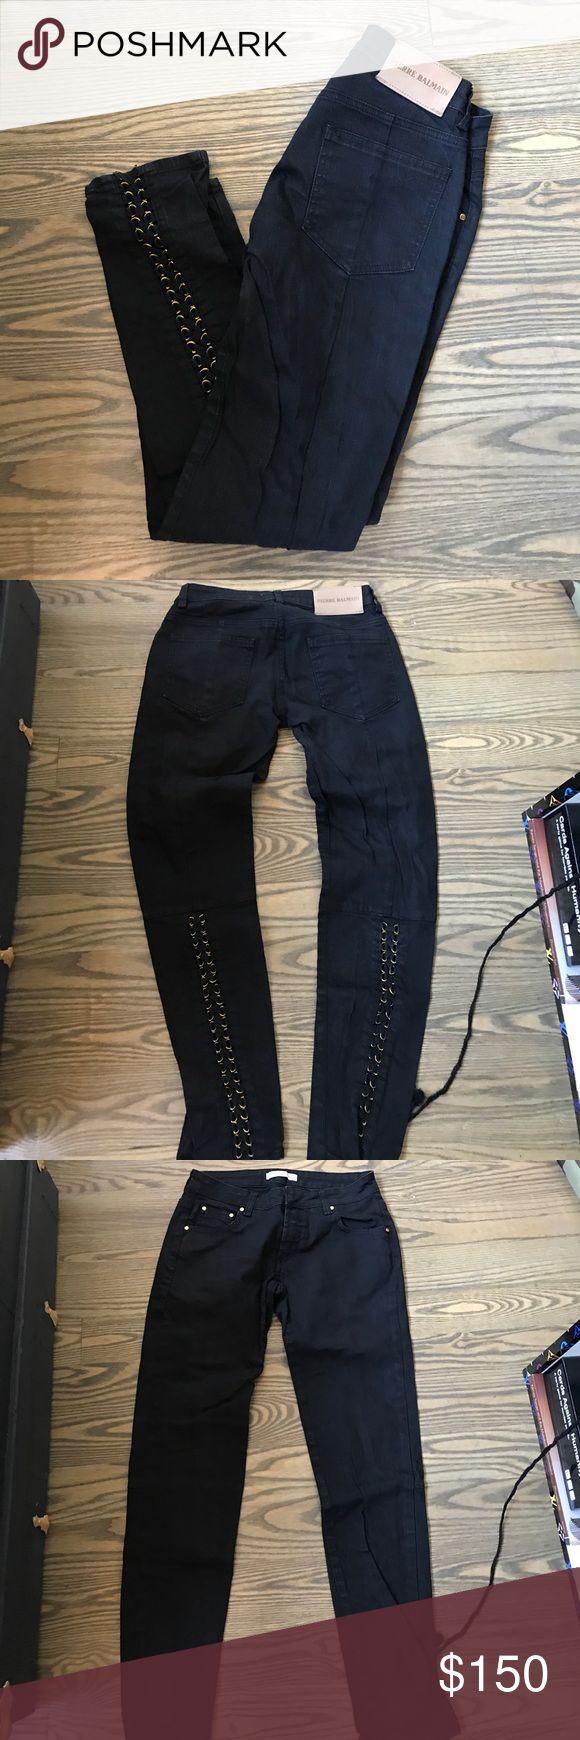 Pierre balmain black denim corset jeans Never worn new with tags Pierre Balmain Jeans